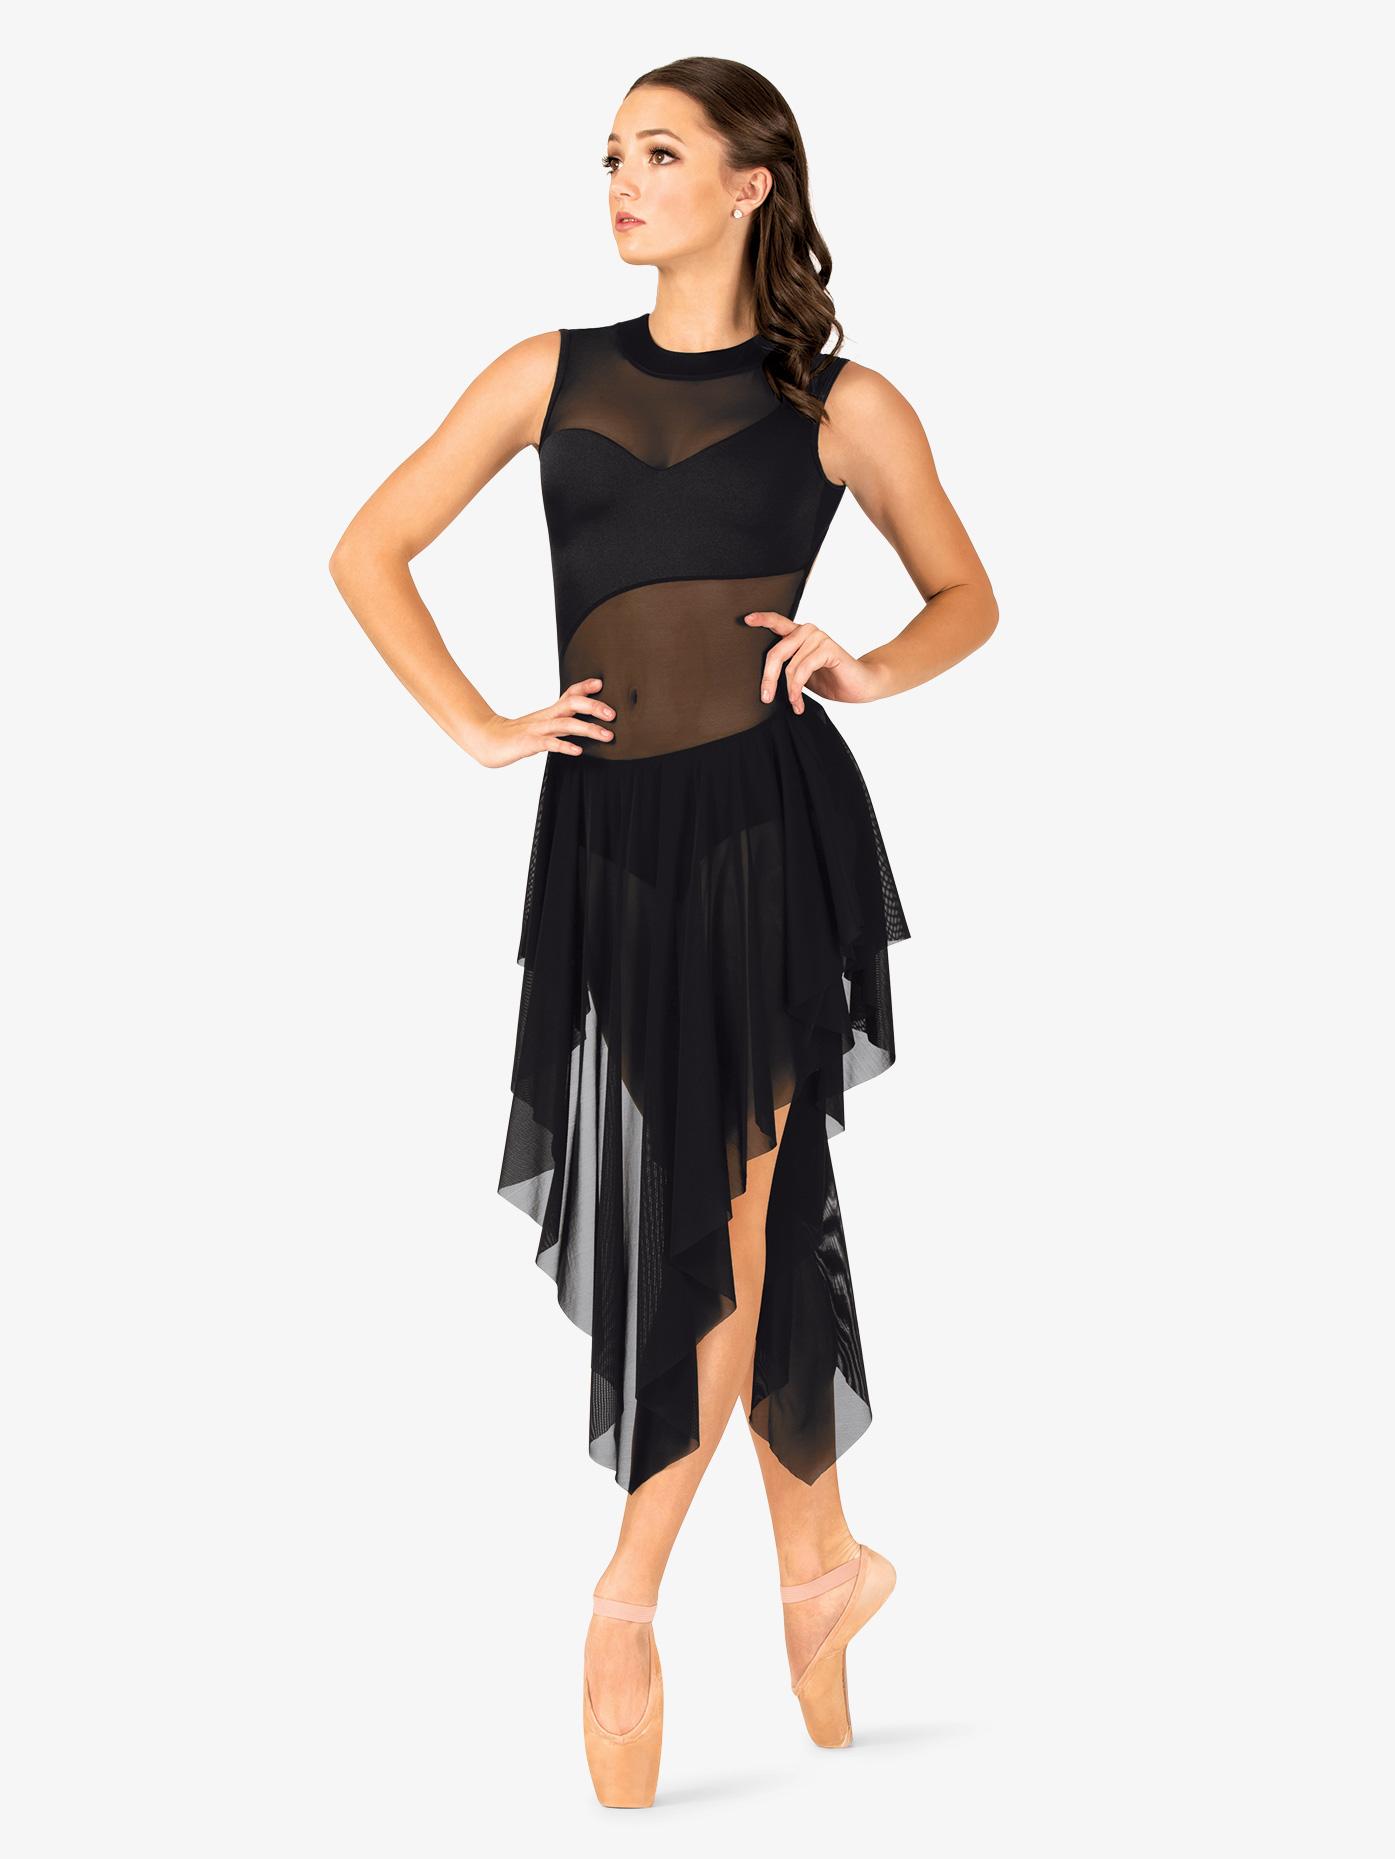 Double Platinum Womens Performance Asymmetrical Mesh Tank Dress N7705